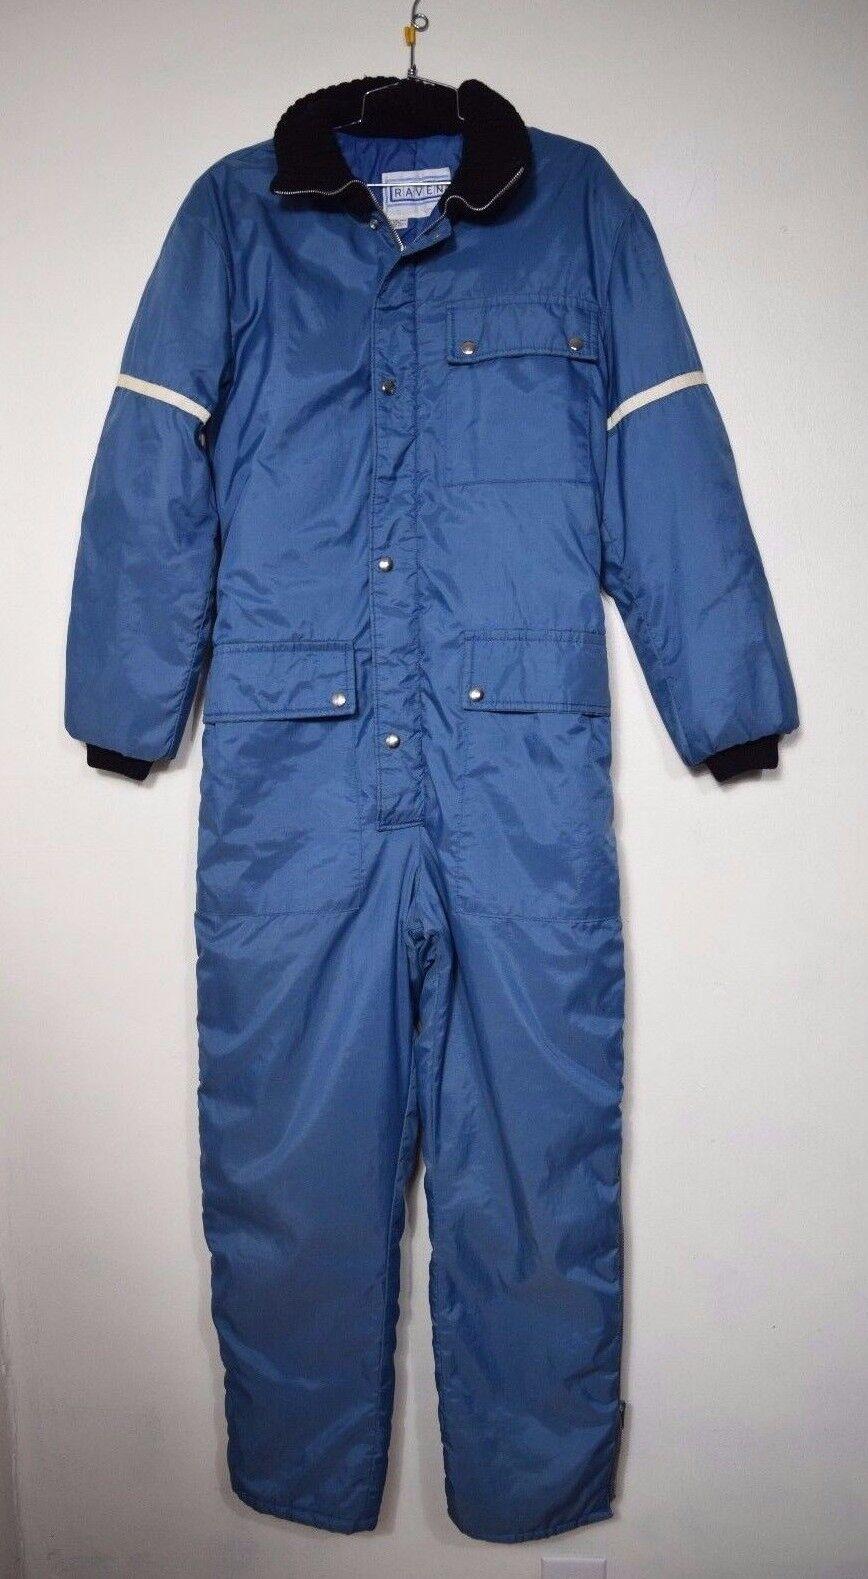 Raven Ski Wear Vintage Men's Ski Snowboarding Suit Size See All Measurements